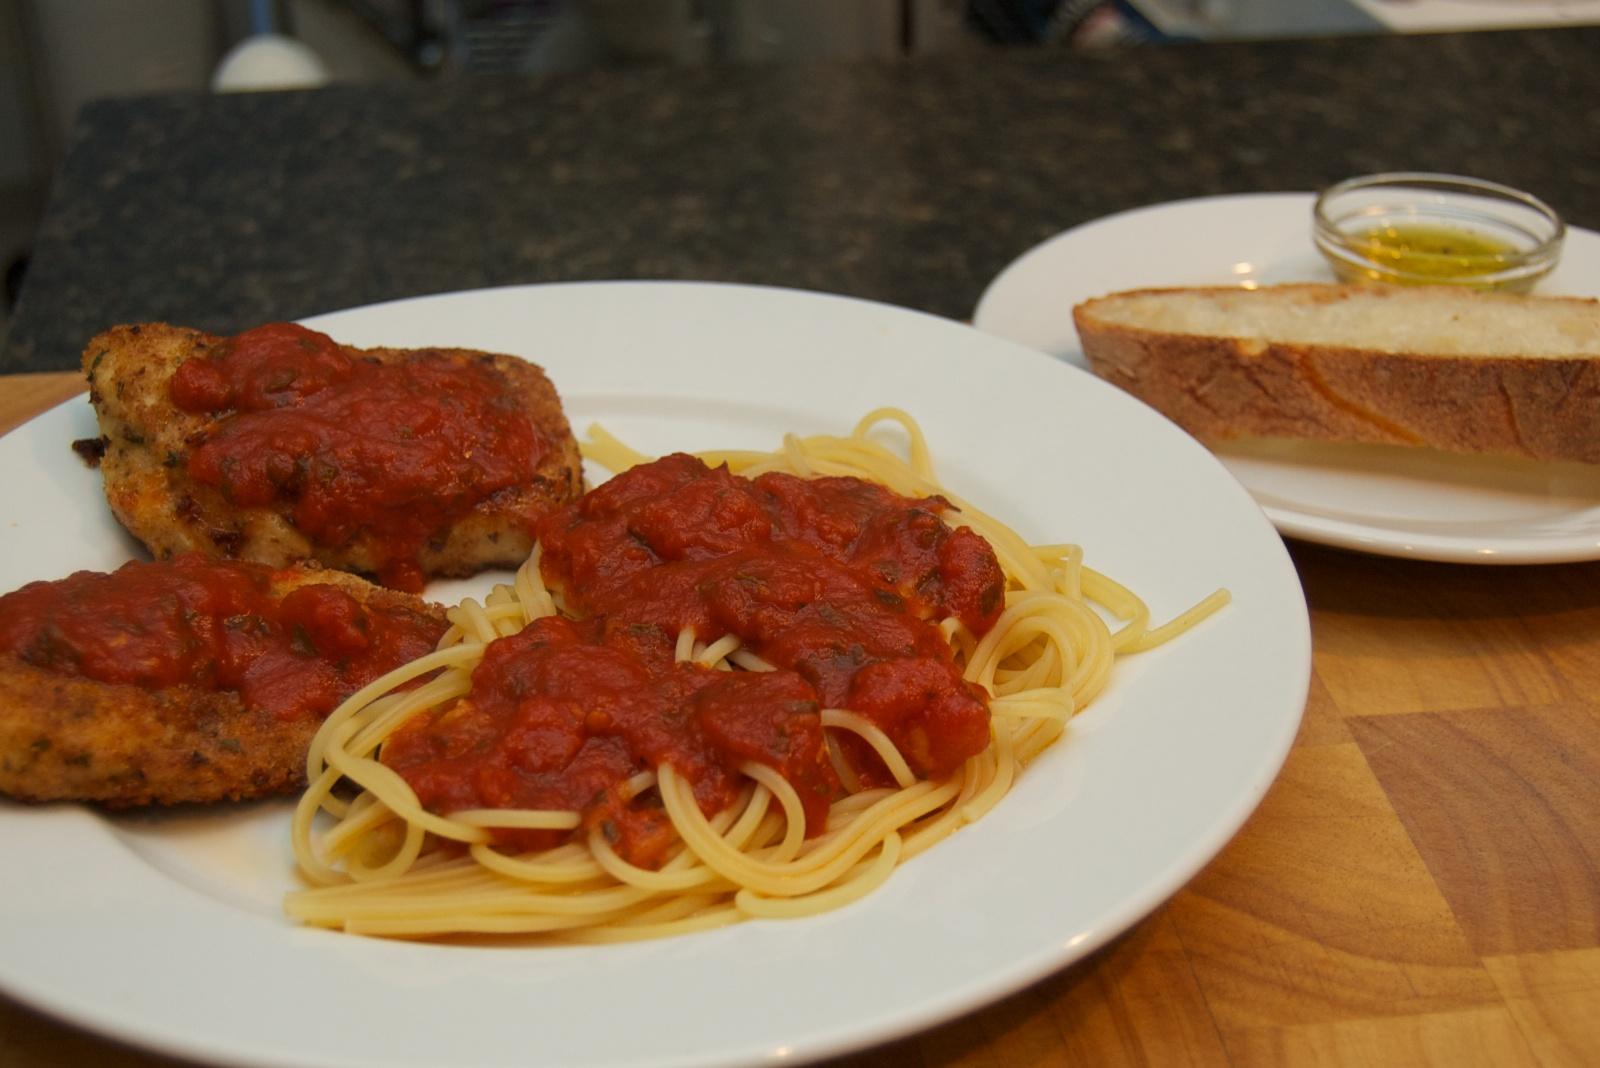 http://blog.rickk.com/food/2011/01/05/ate.2011.01.04.d.jpg